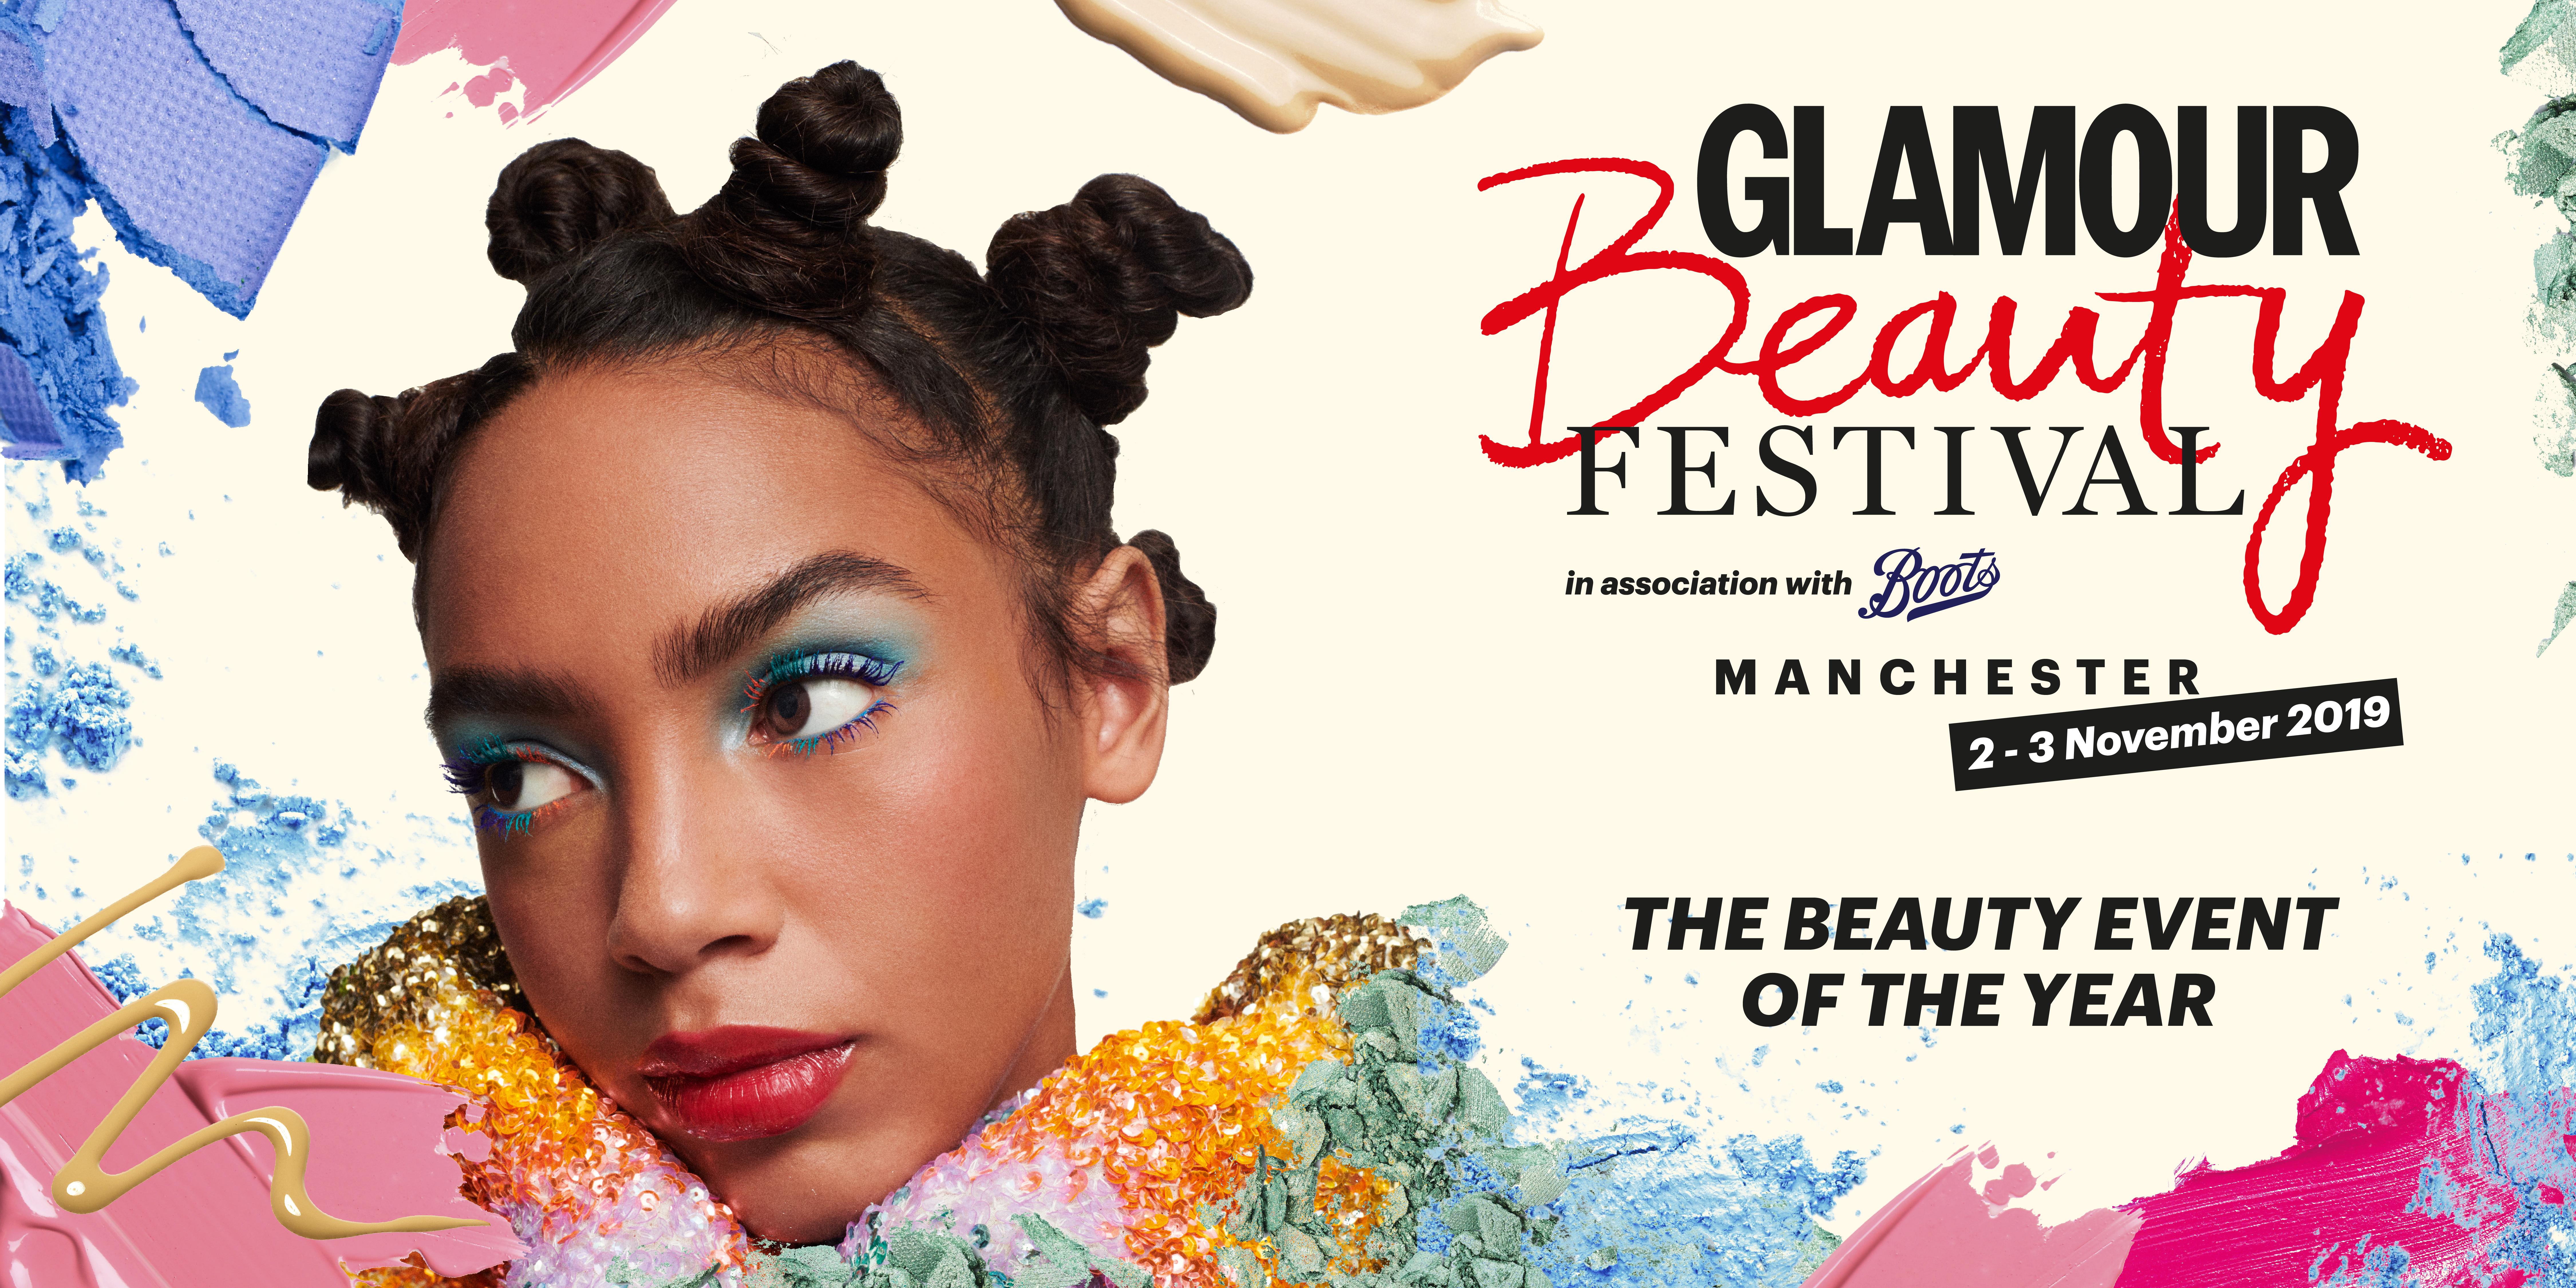 GBF - Manchester 2019 - Donna Dia - UK - Glamour Beauty Festival